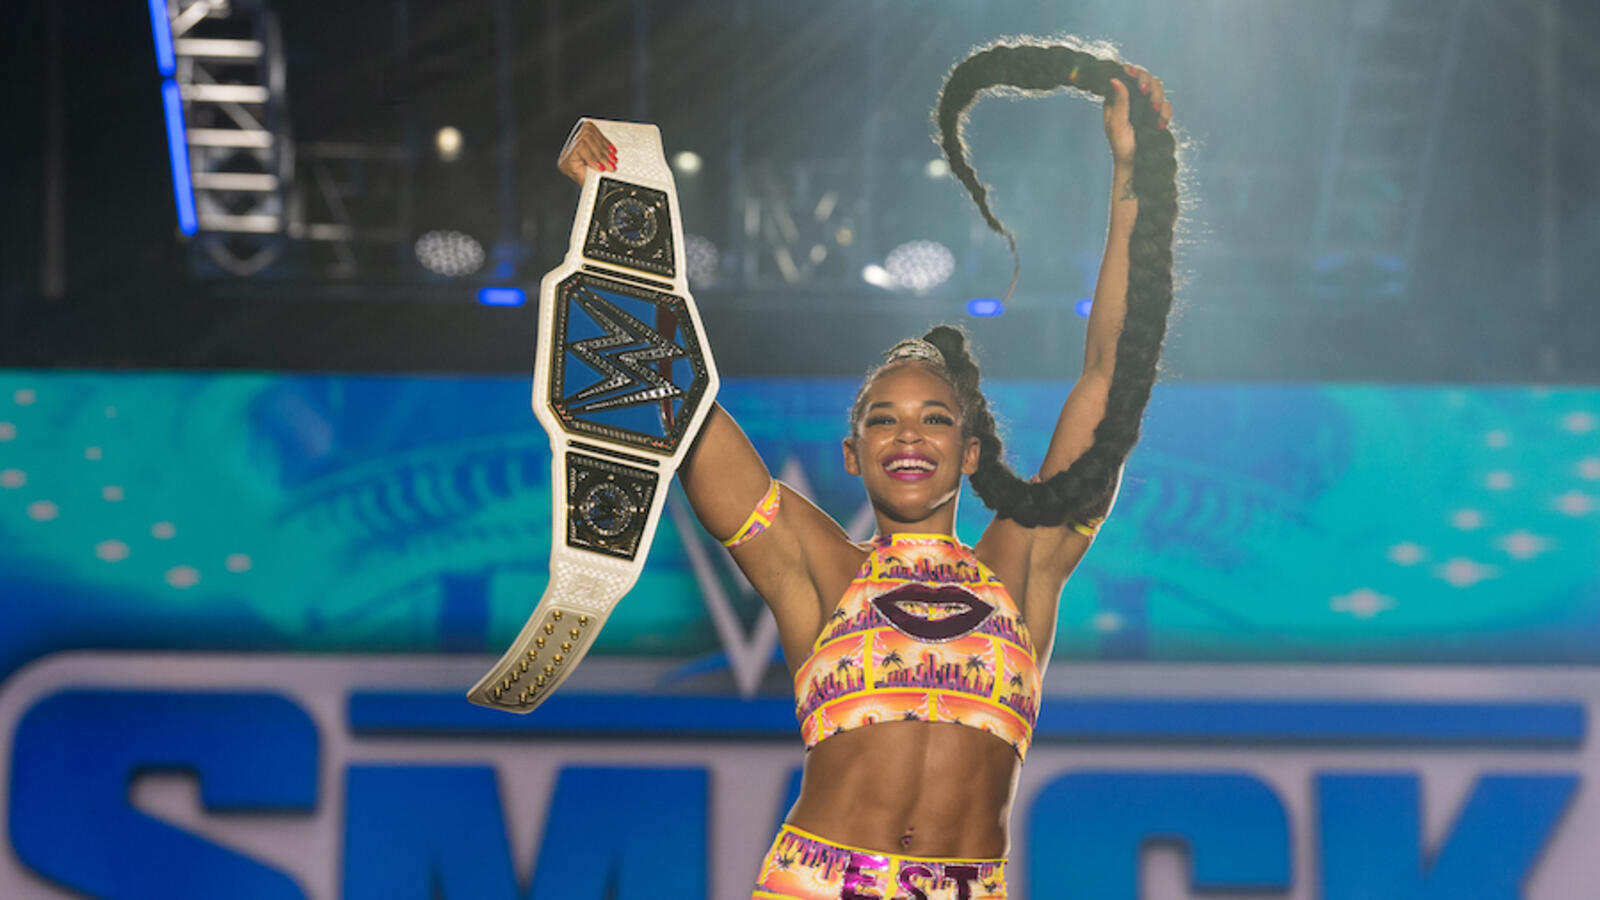 Bianca Belair Tops Annual PWI Women's 150 List; Top 5 Revealed